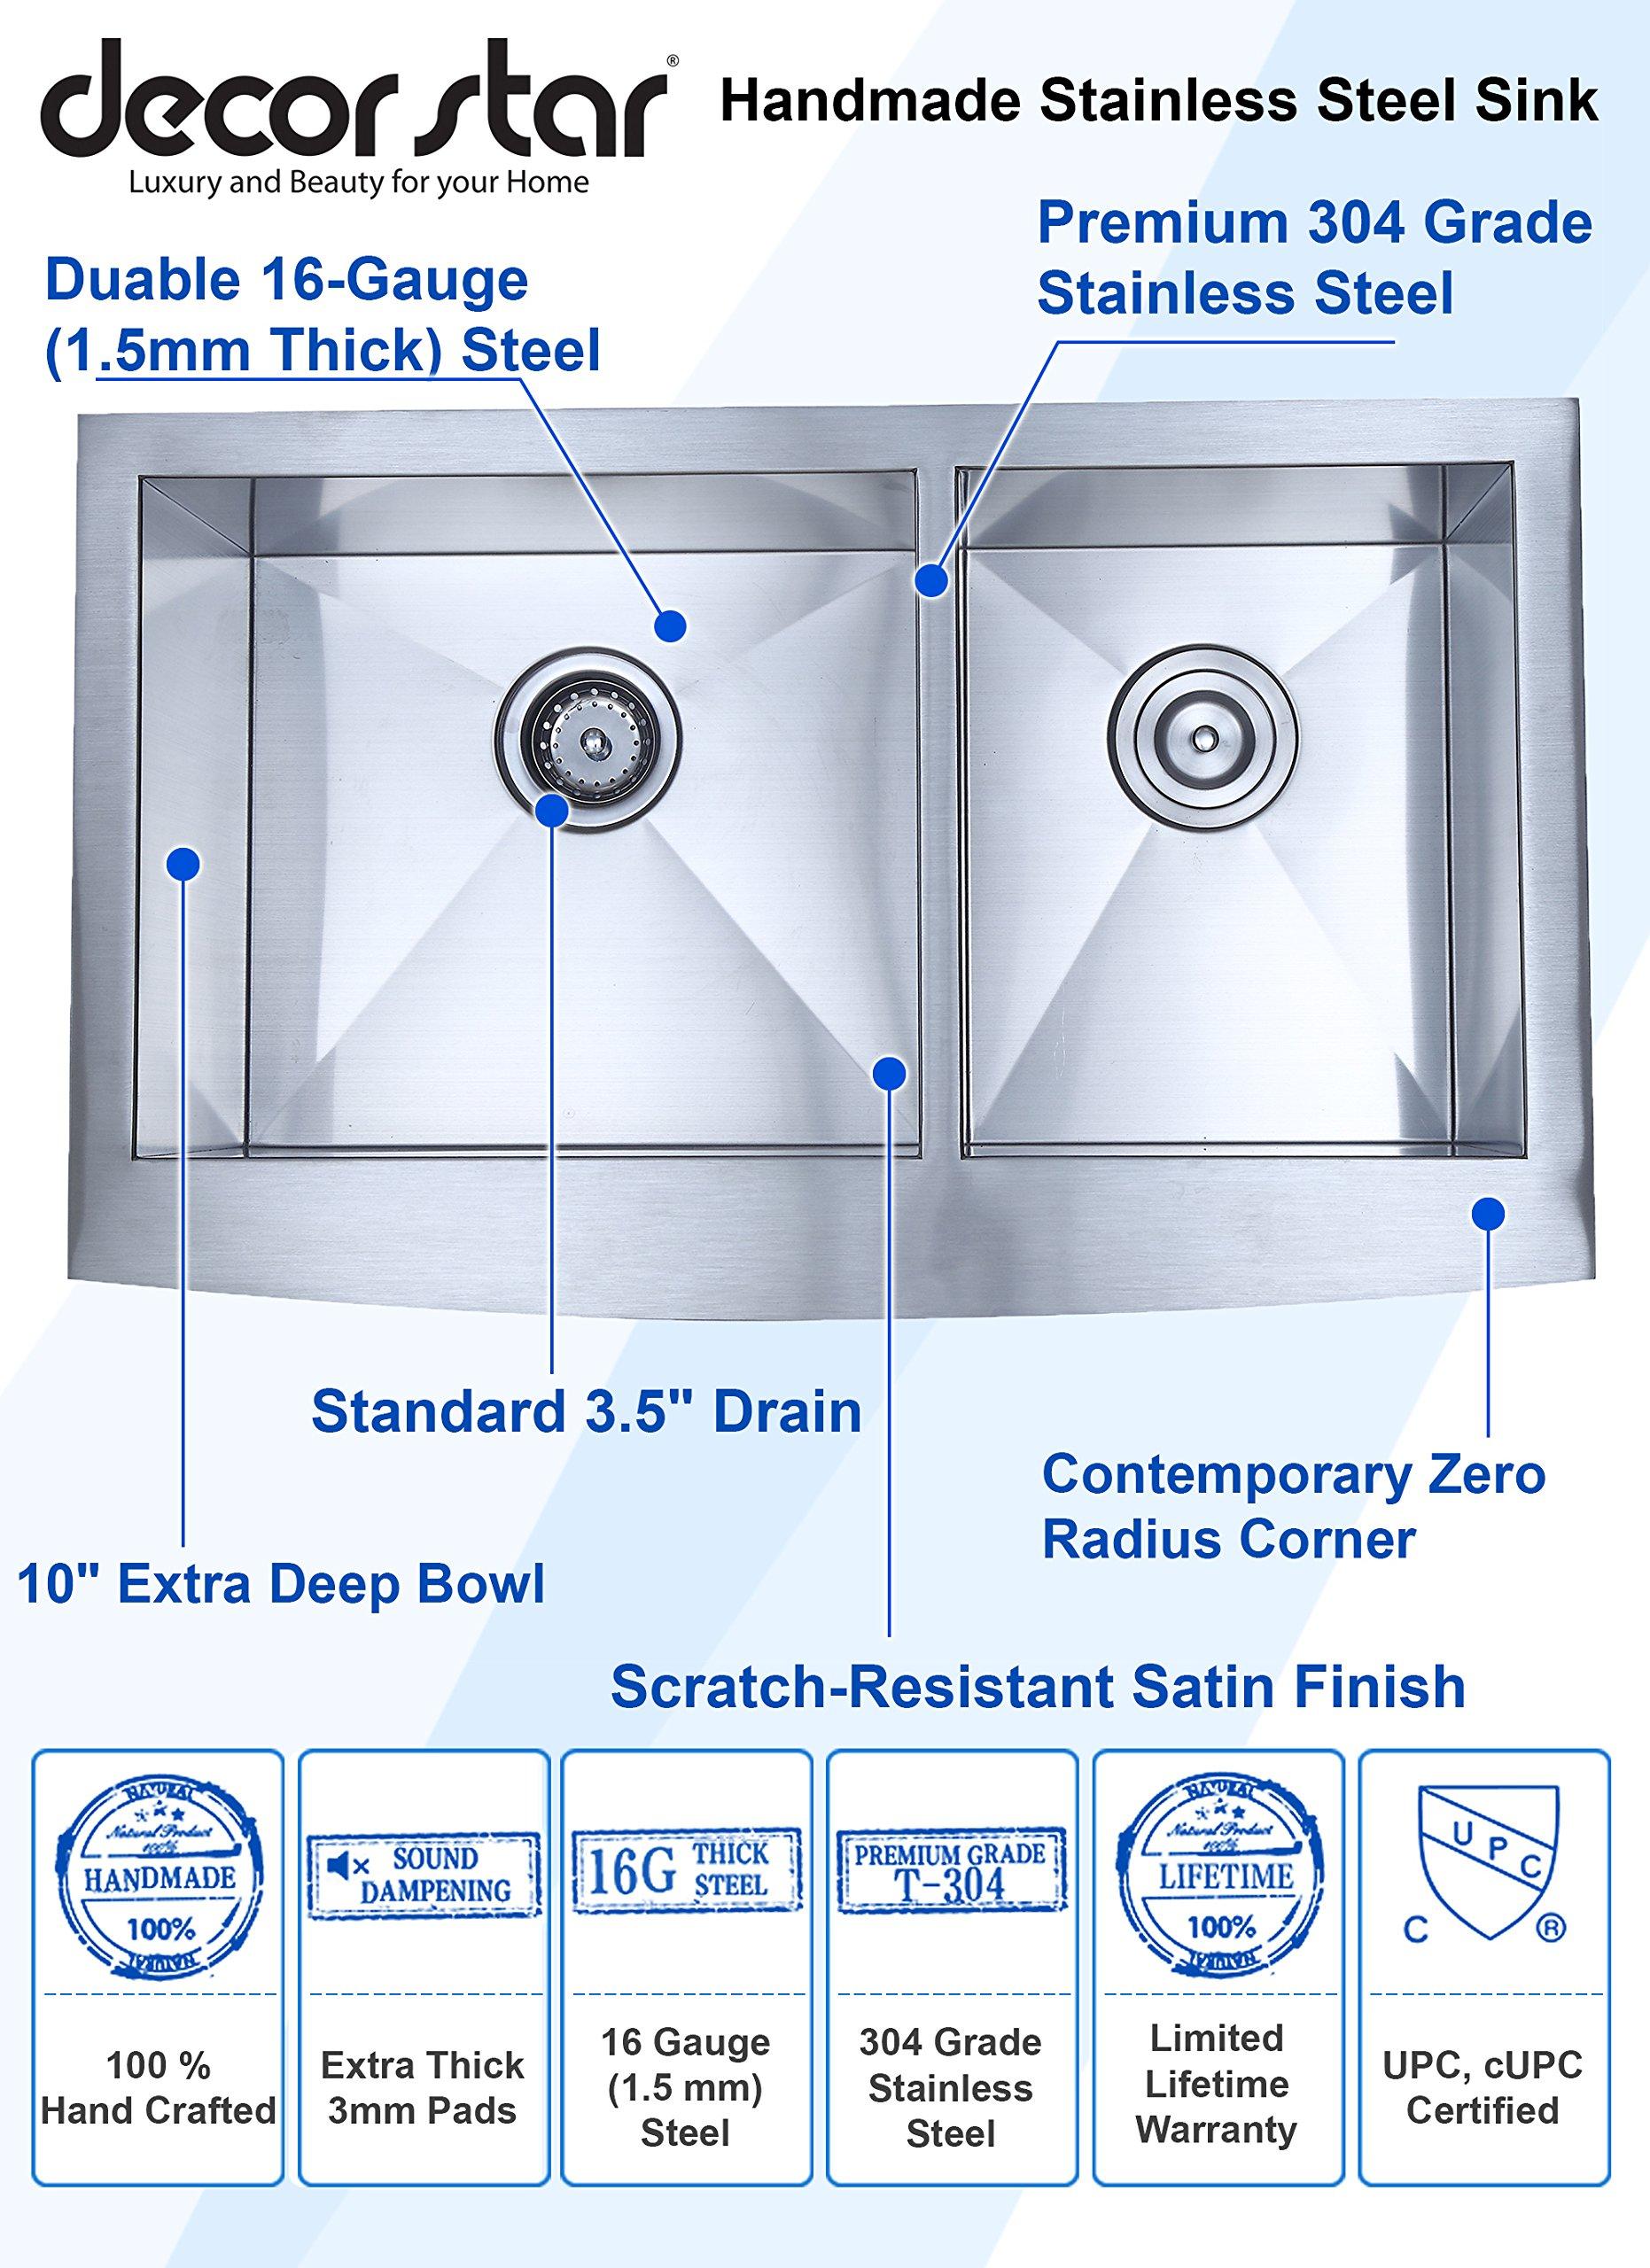 Decor Star F-002-Z 33 Inch x 20 Inch Farmhouse Apron 60/40 Offset Double Bowl 16 Gauge Stainless Steel Luxury Handmade Kitchen Sink cUPC Zero Radius by Décor Star (Image #2)